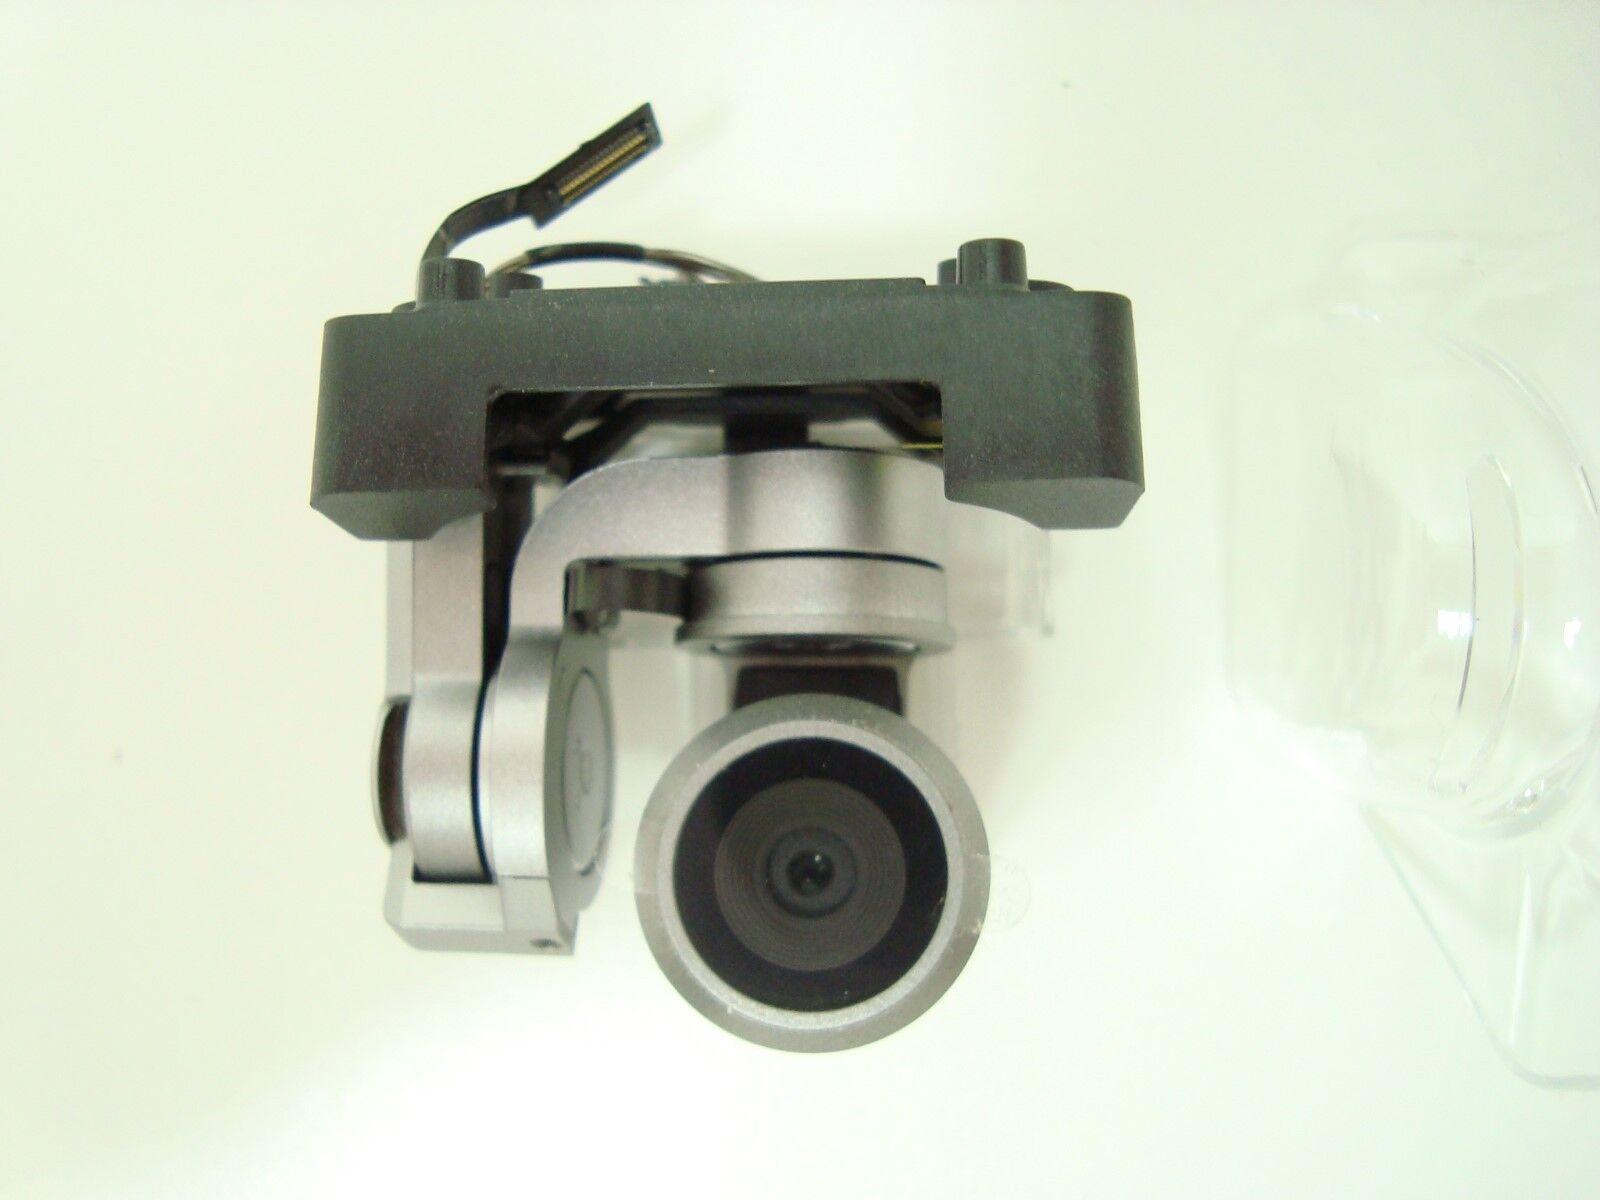 DJI Mavic Pro Gimbal Camera As...